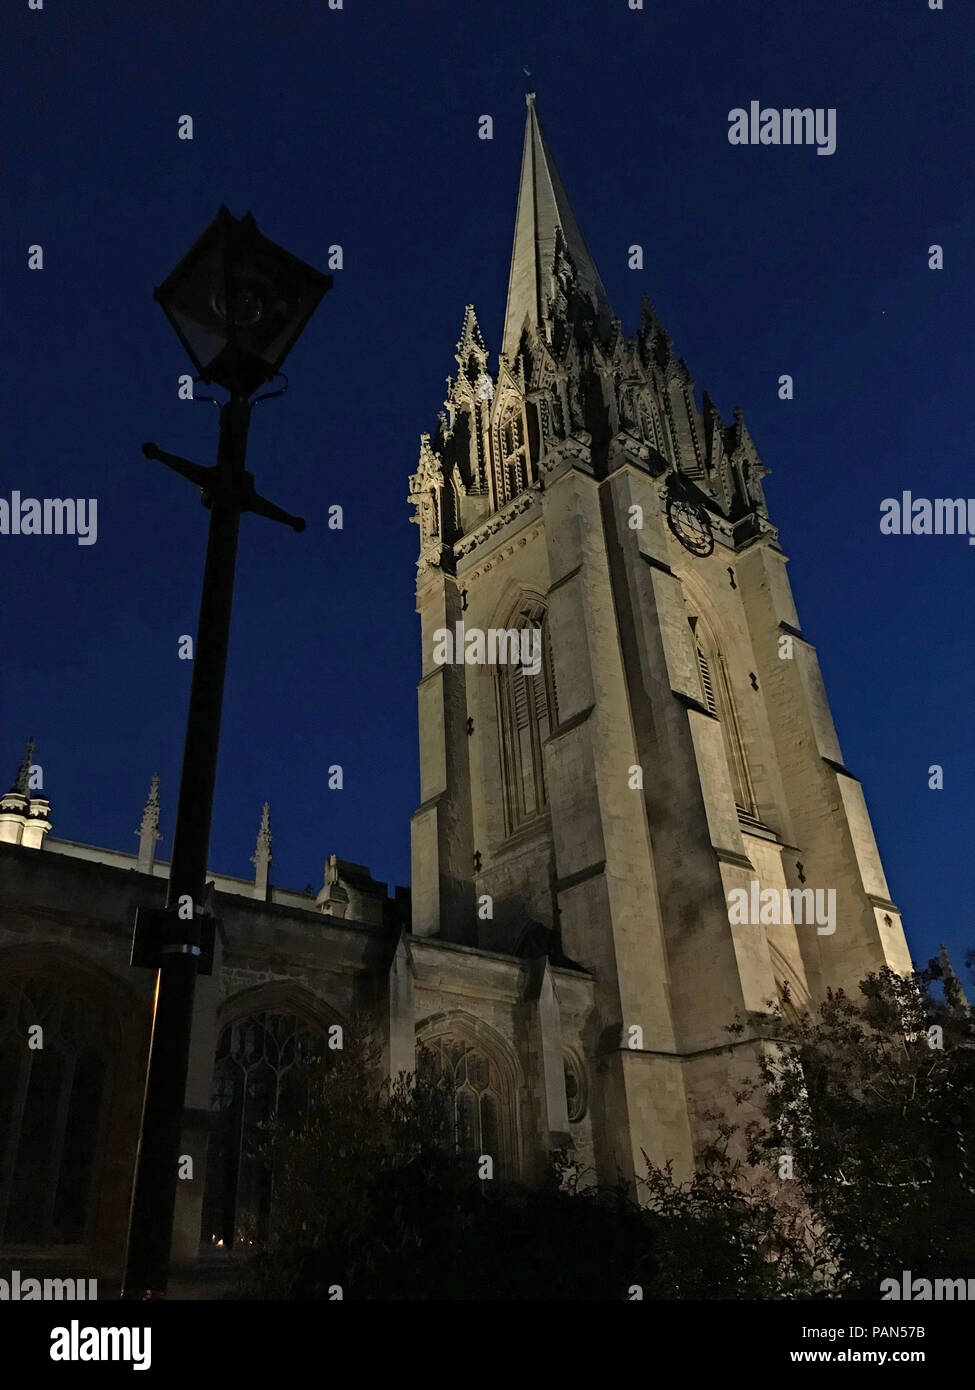 Oxford, Oxfordshire, South East England, Uk - Stock Image